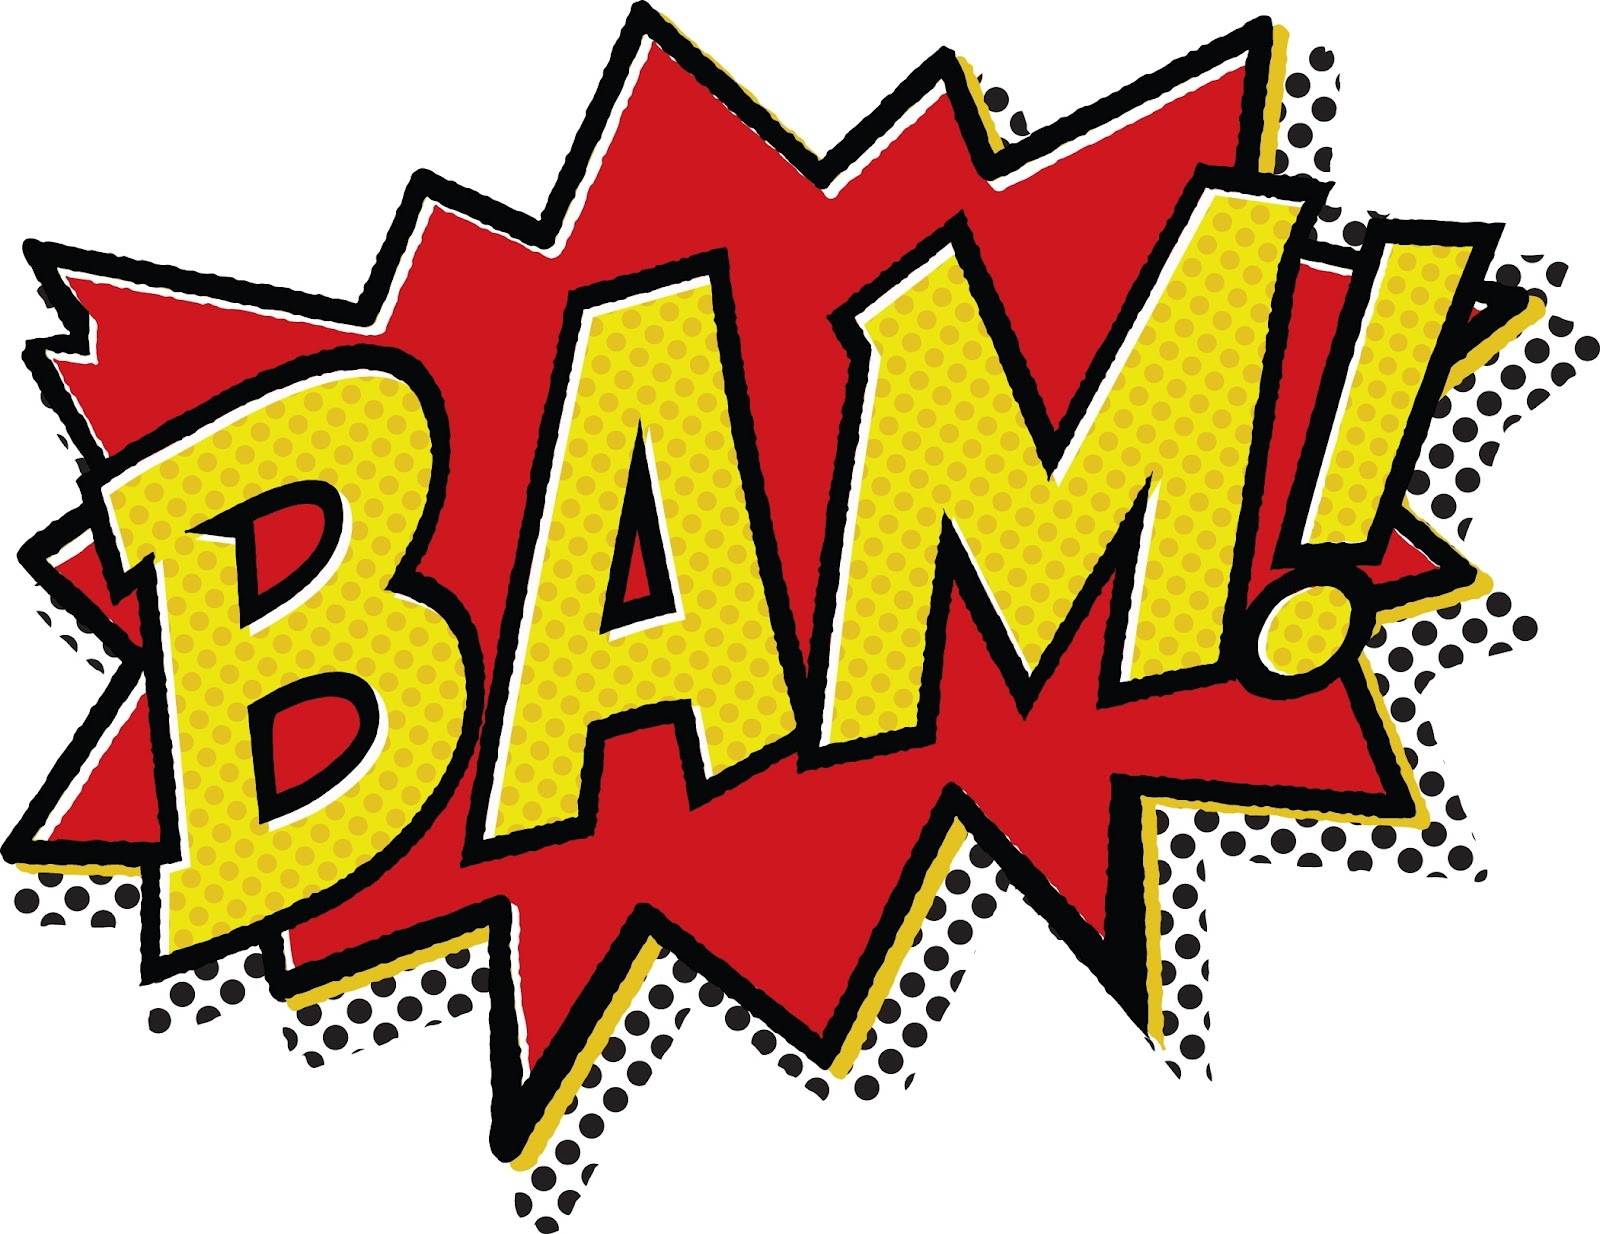 Bam clipart black and white stock Batman Bam Clipart | Clipart Panda - Free Clipart Images black and white stock